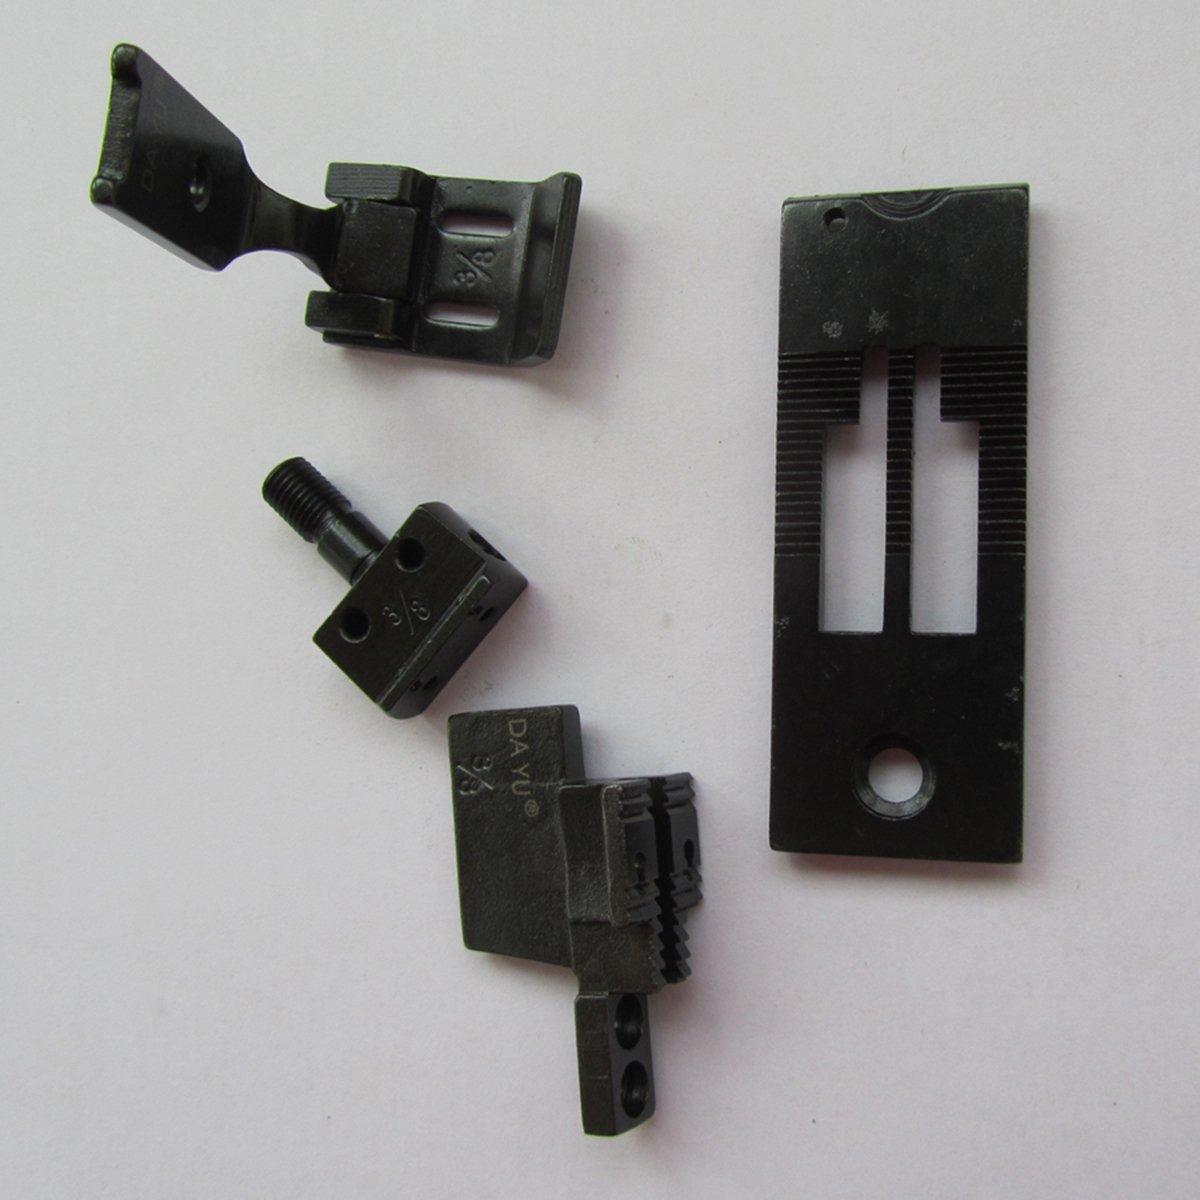 O-Ring 38 Hilti TE 6 // TE 6 A Pleuel Wellendichtring für Werkzeugaufnahme!